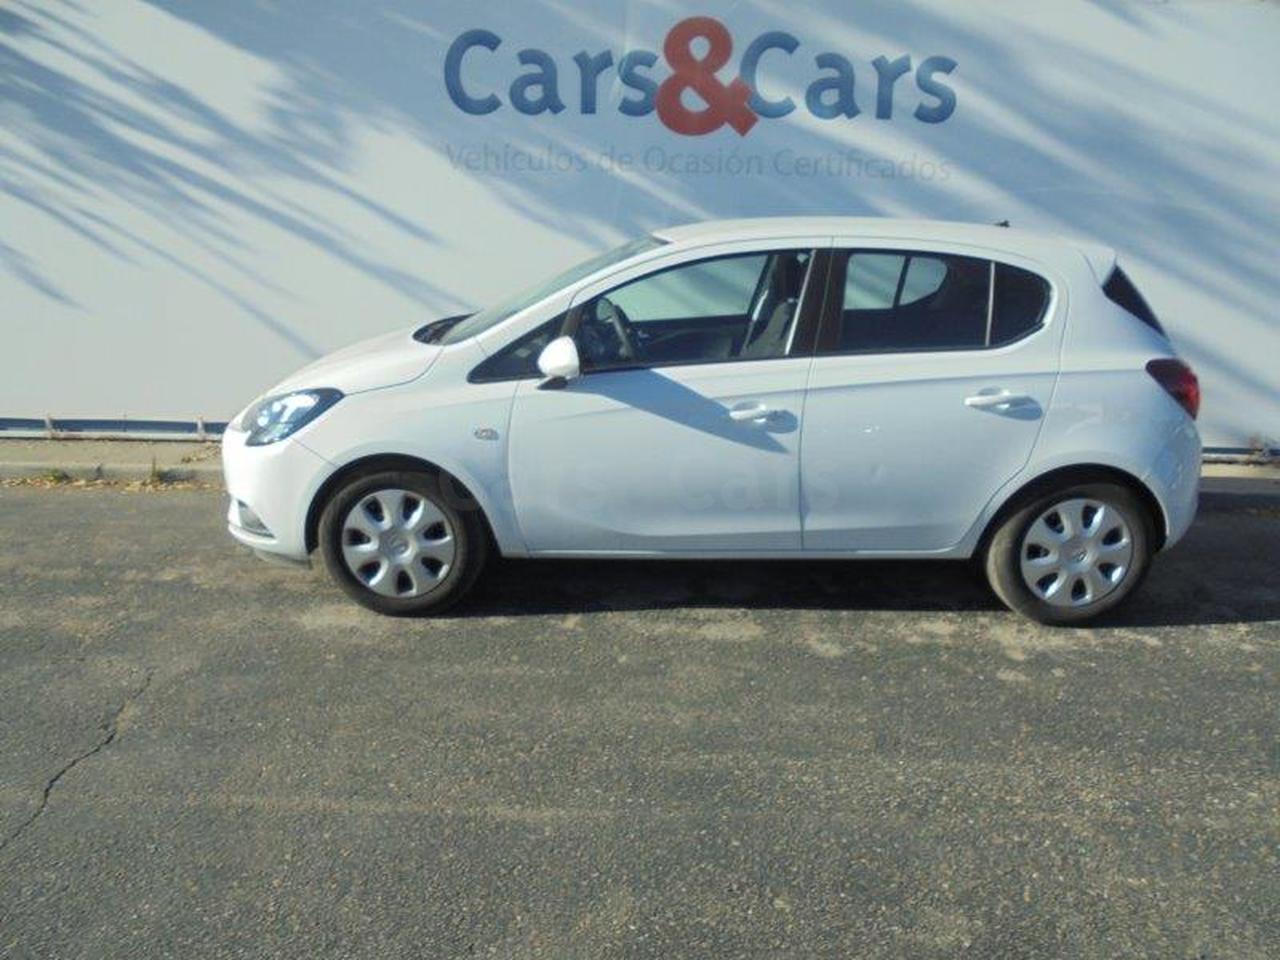 Opel Corsa ocasión segunda mano 2019 Gasolina por 10.995€ en Madrid